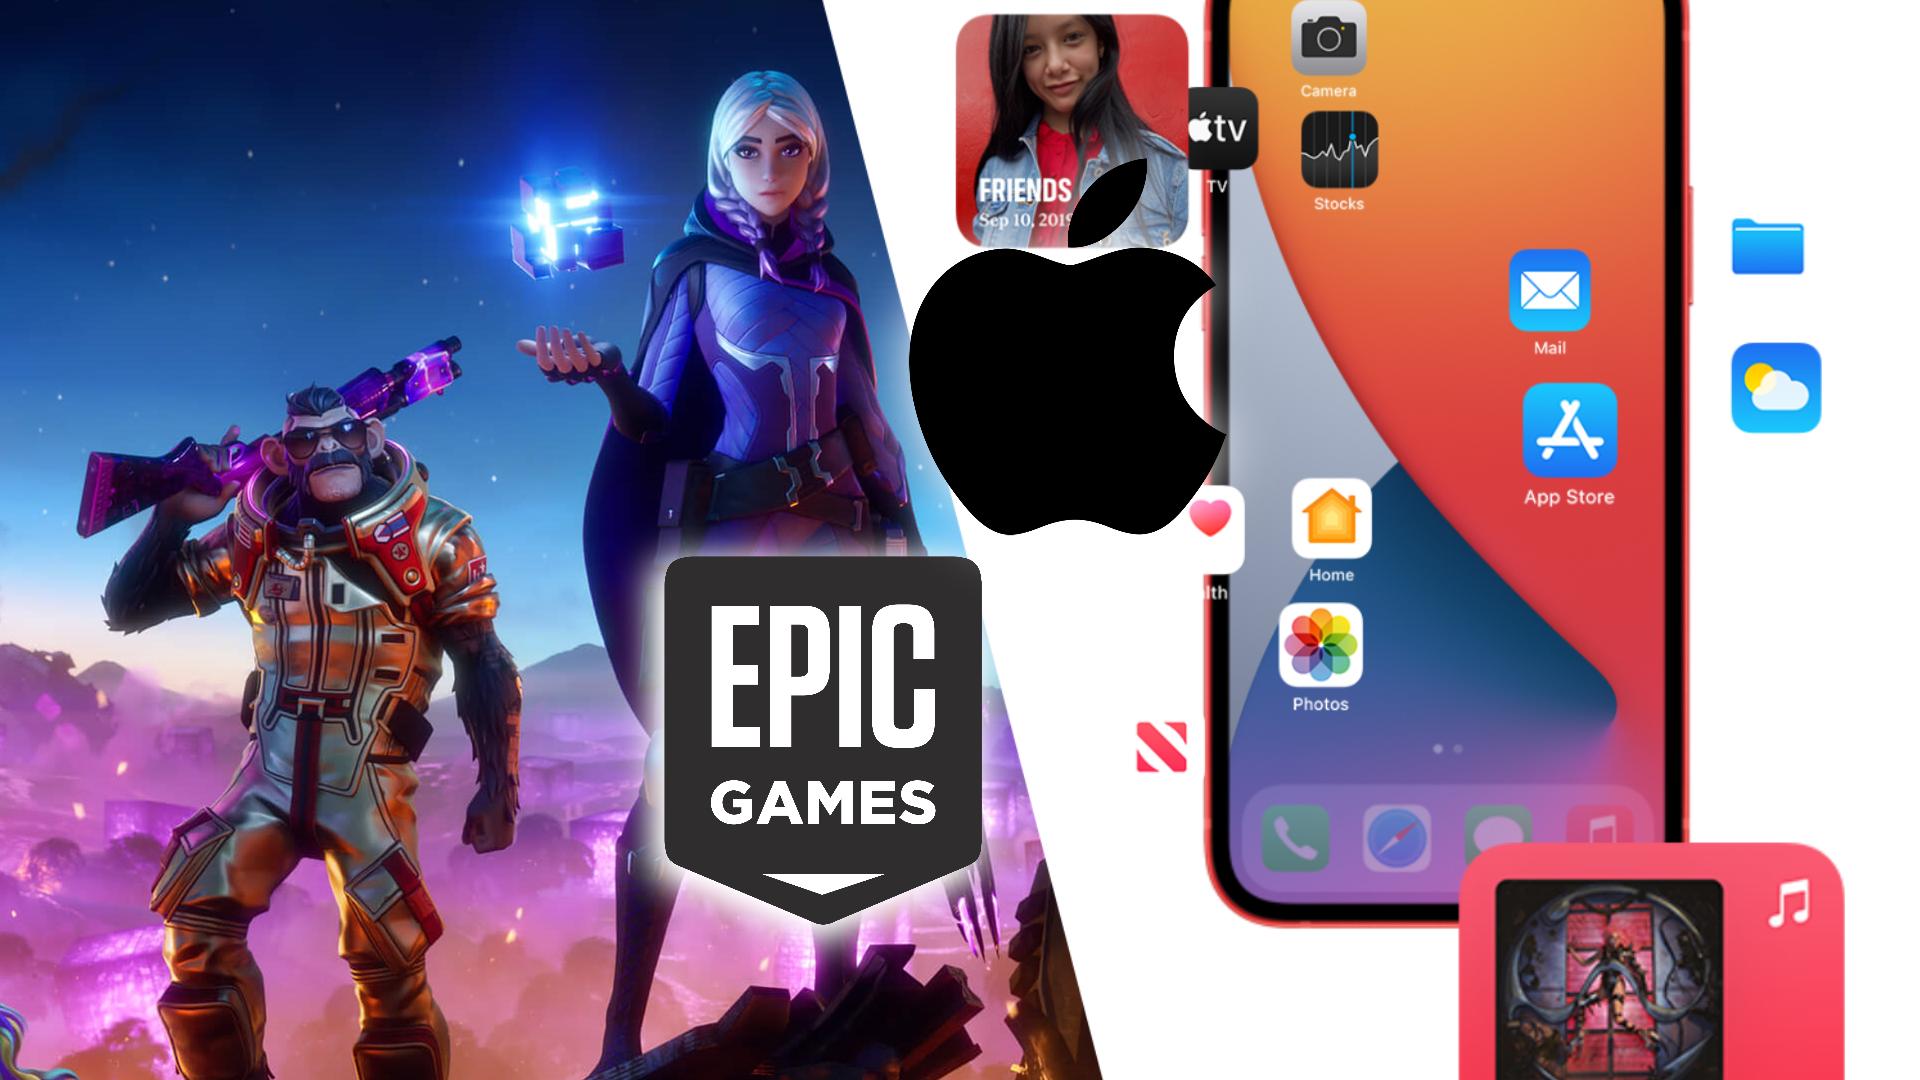 Epic总裁:已按法院裁决向苹果支付6百万美元赔偿